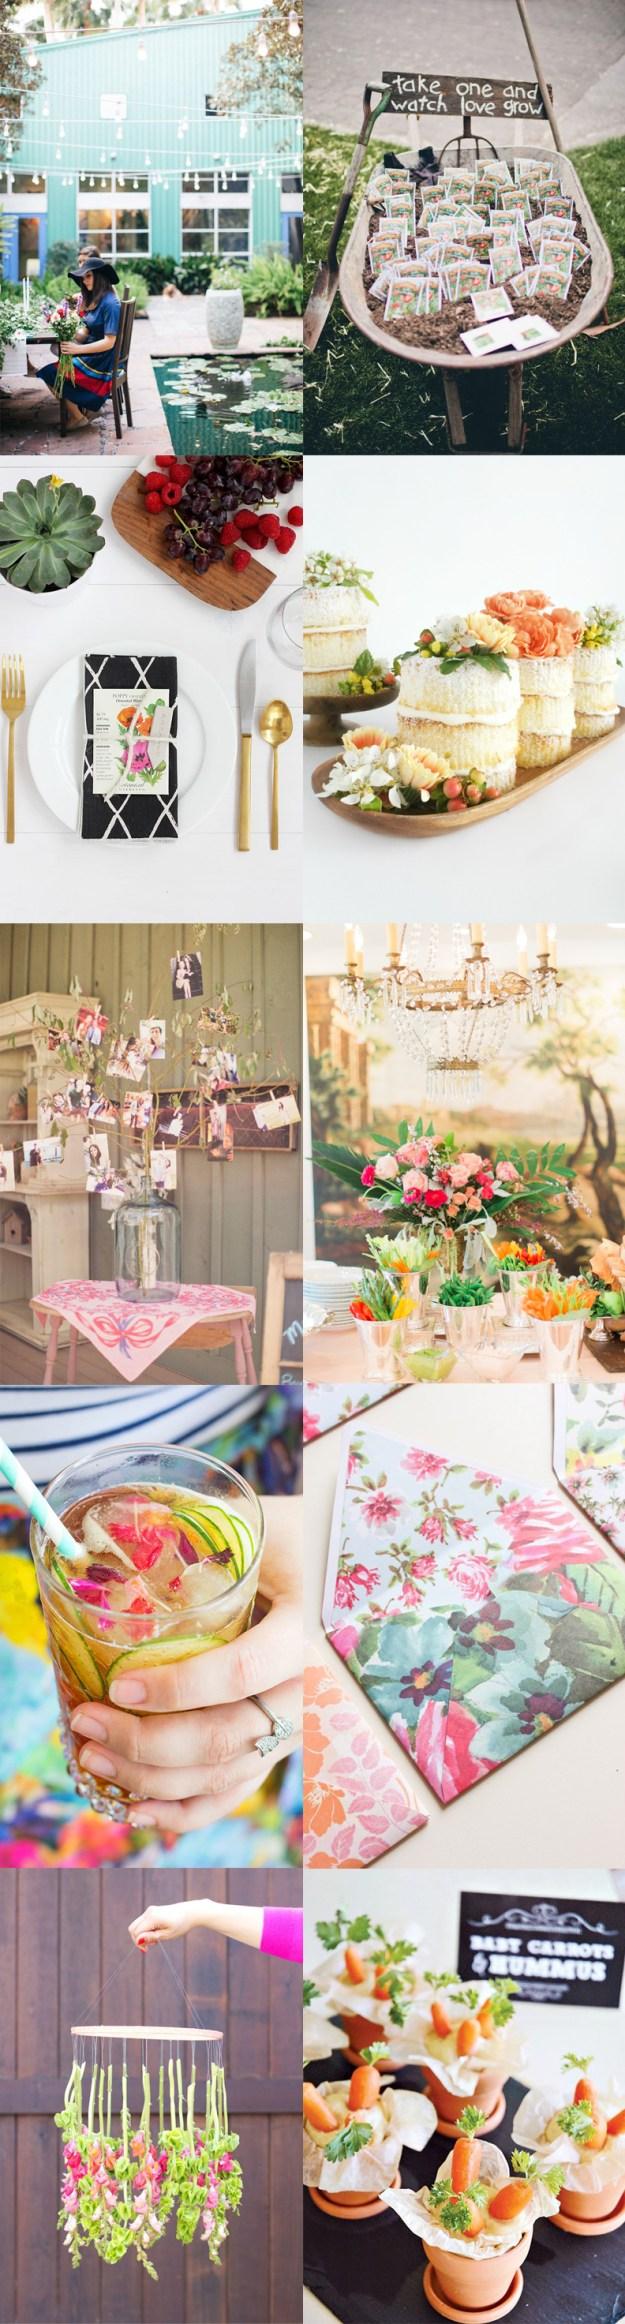 A Garden Party Bridal Shower Inspiration Board